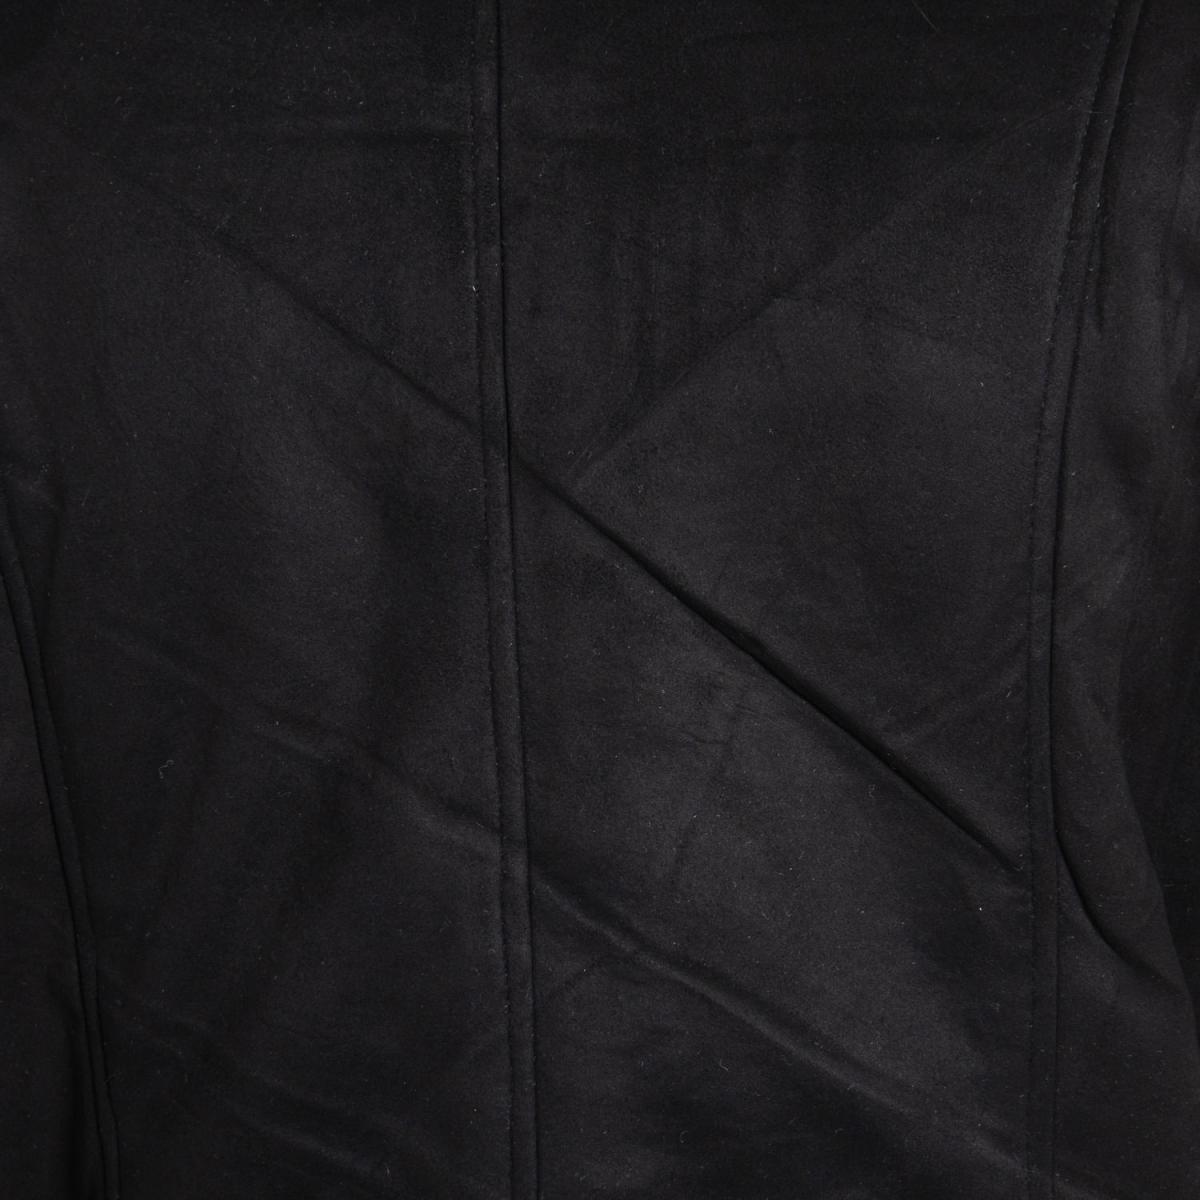 vêtements Vestes homme LPP1660 CAMEL Cafedelmar Shop